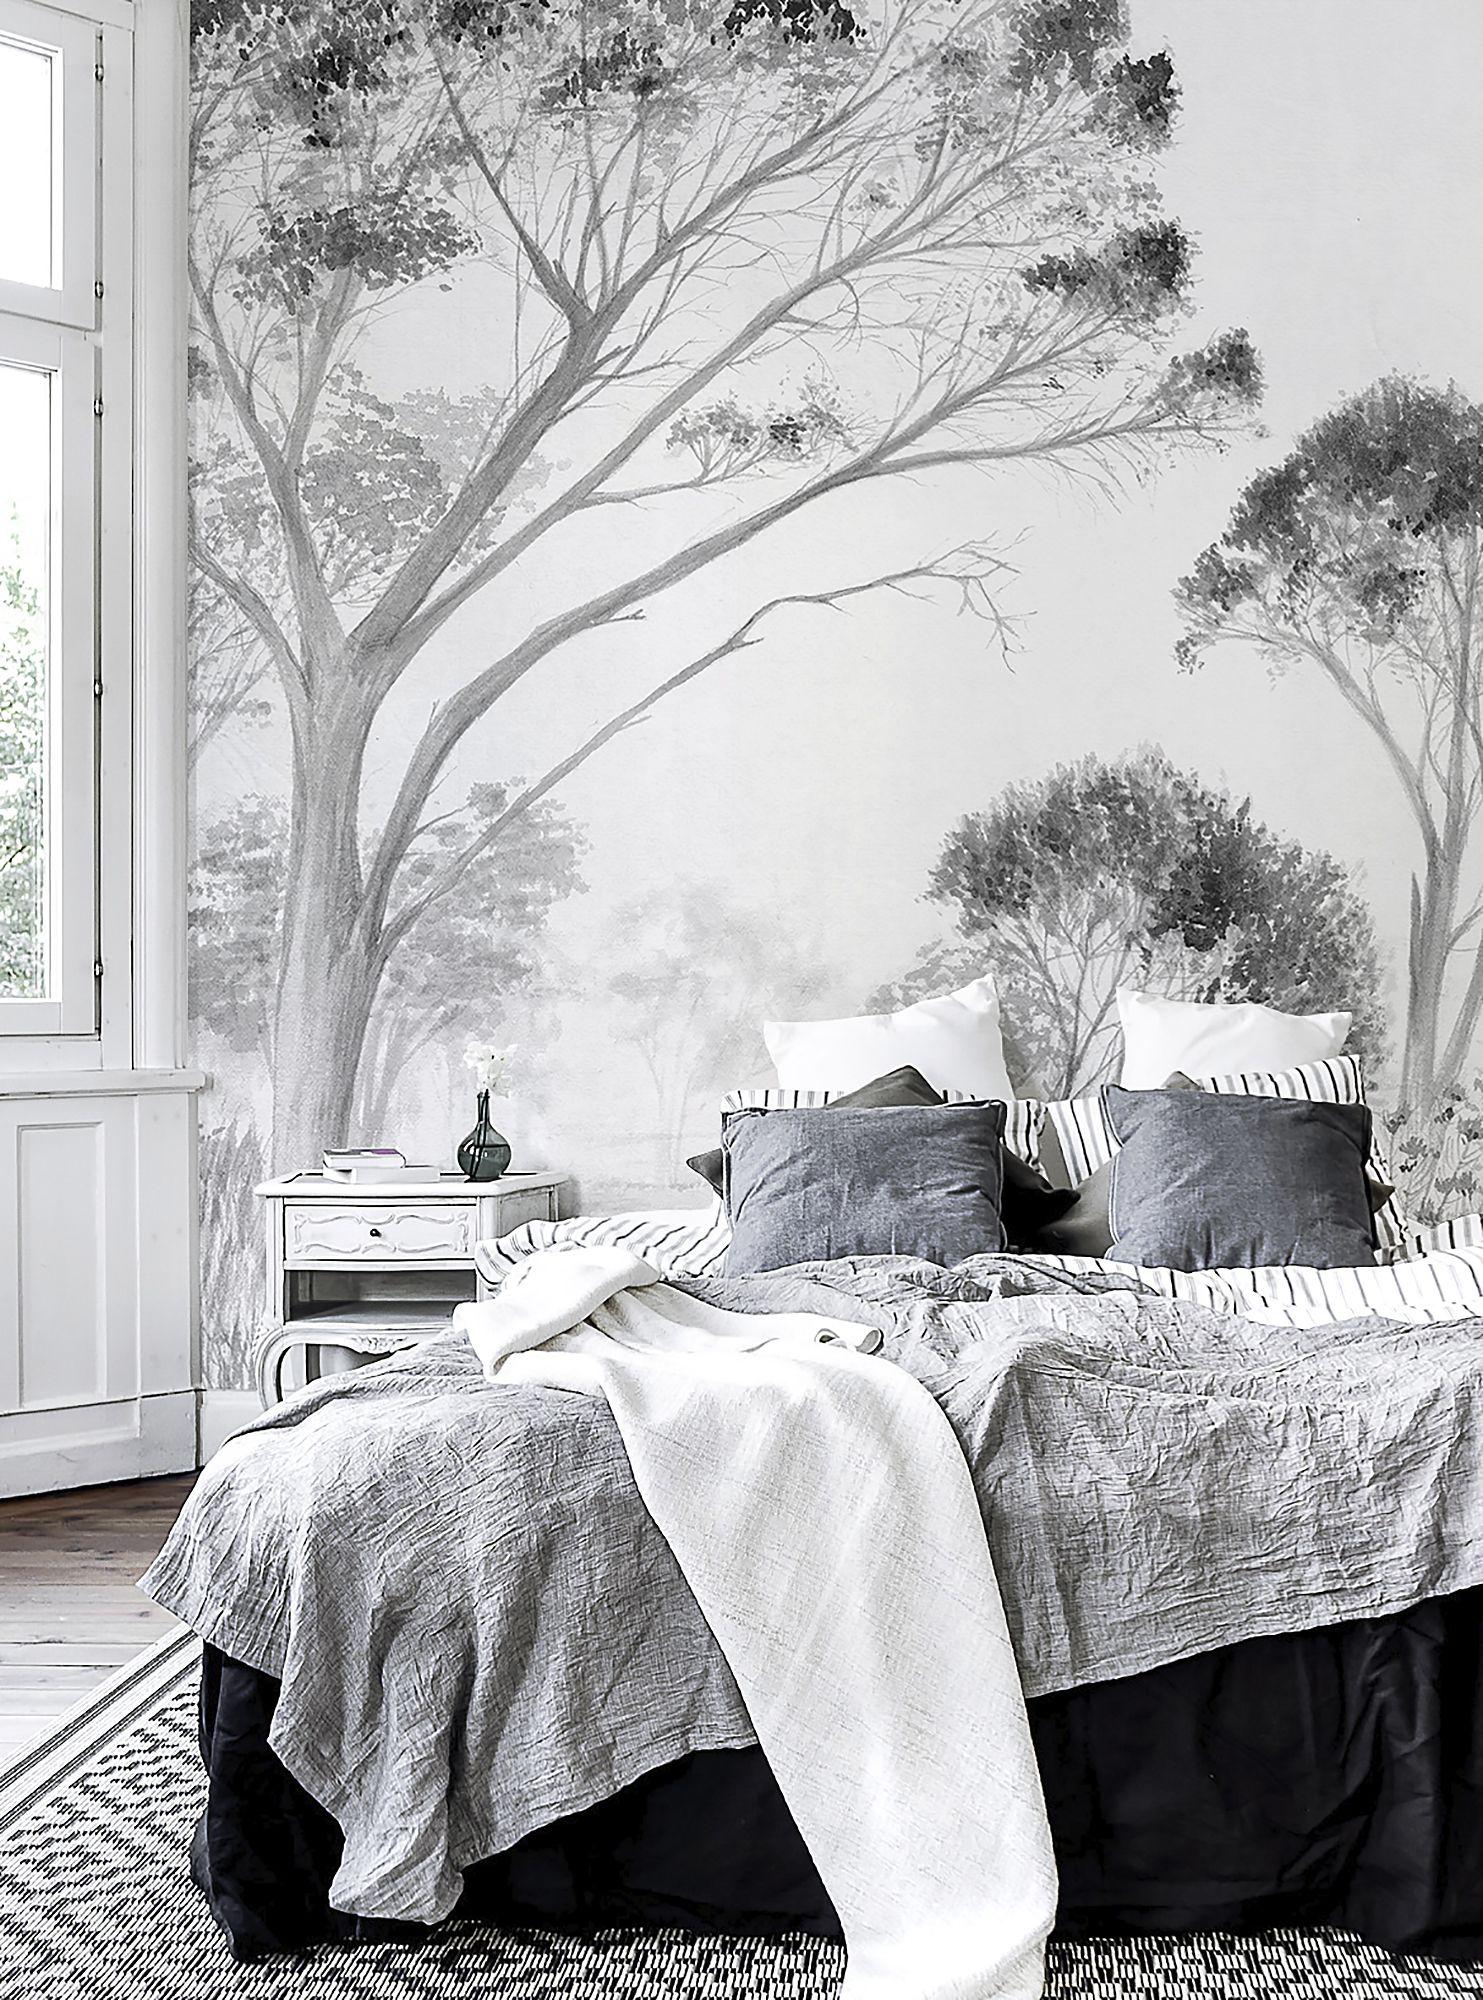 Tree Design Wallpaper Living Room: TREES WHITE Bu Lemon Bring The Elegance Of Nature To Your